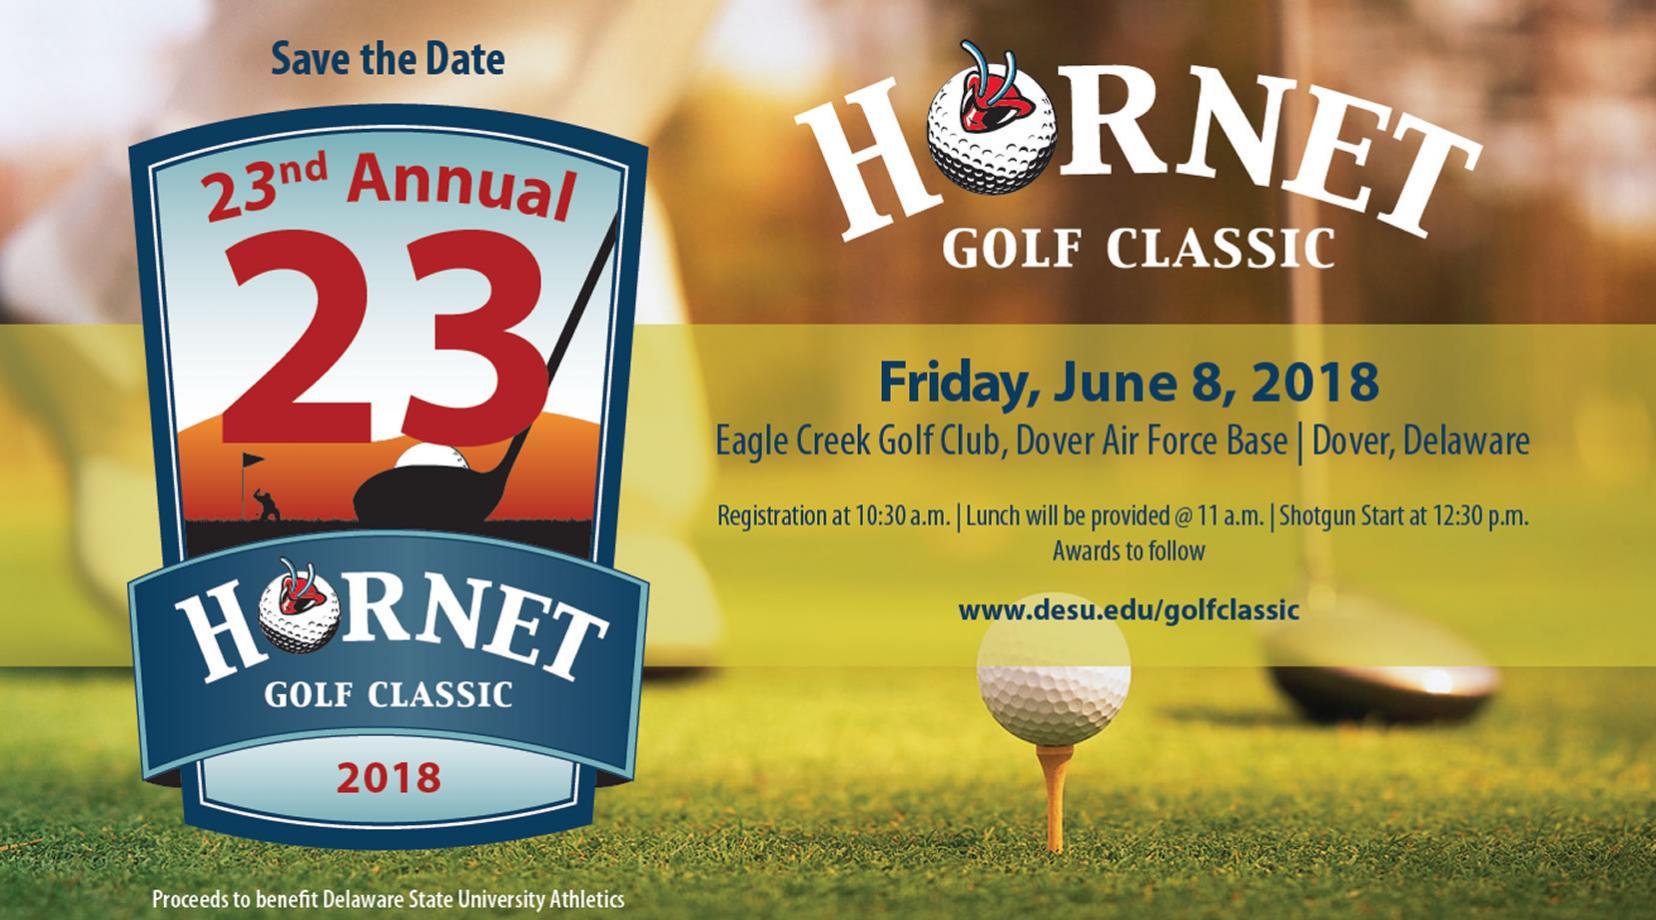 Hornet Golf Classic 2018